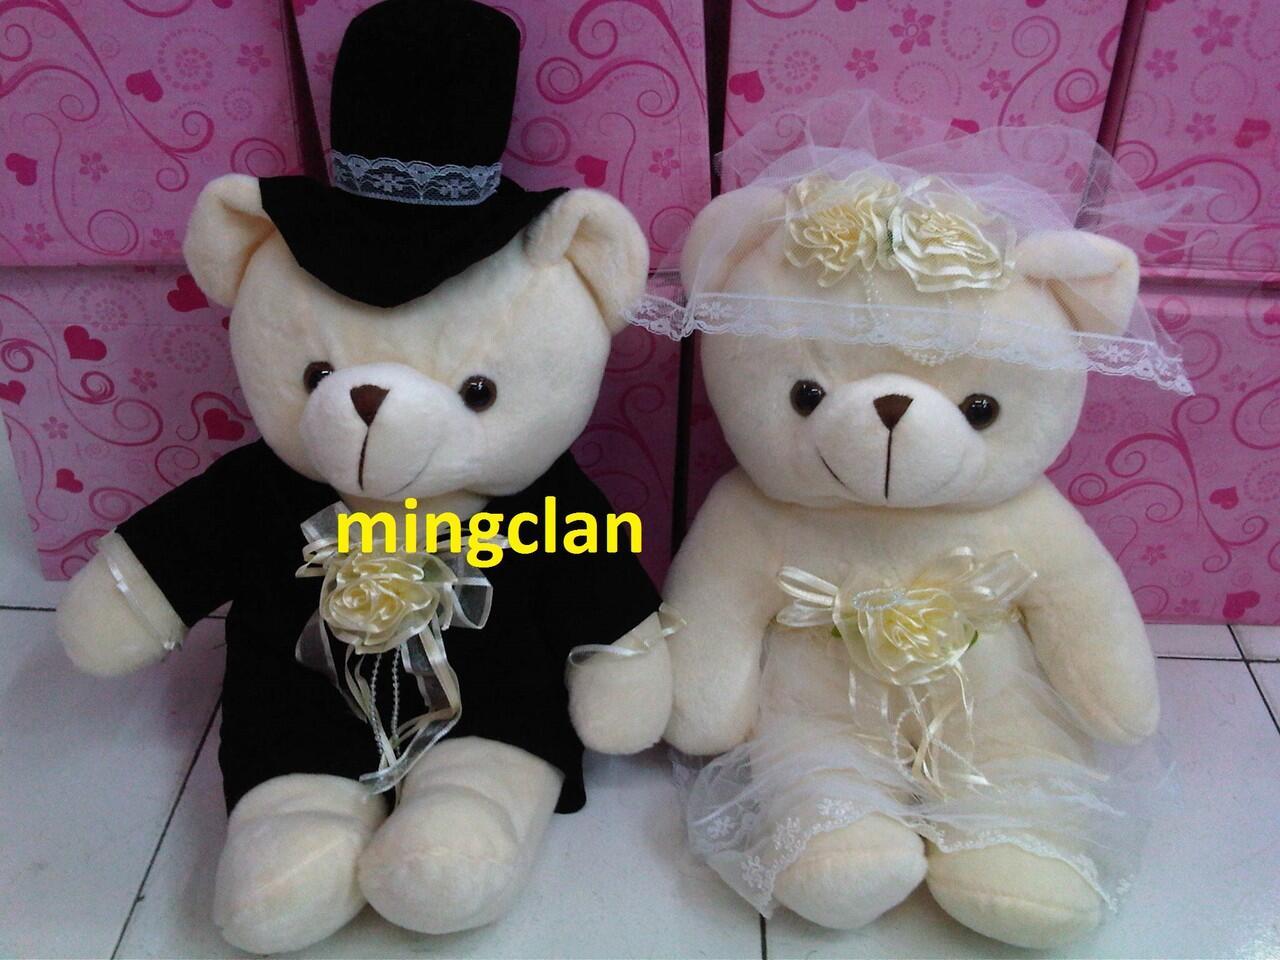 Terjual Jual Boneka - Boneka Wedding  81ad3b22a0